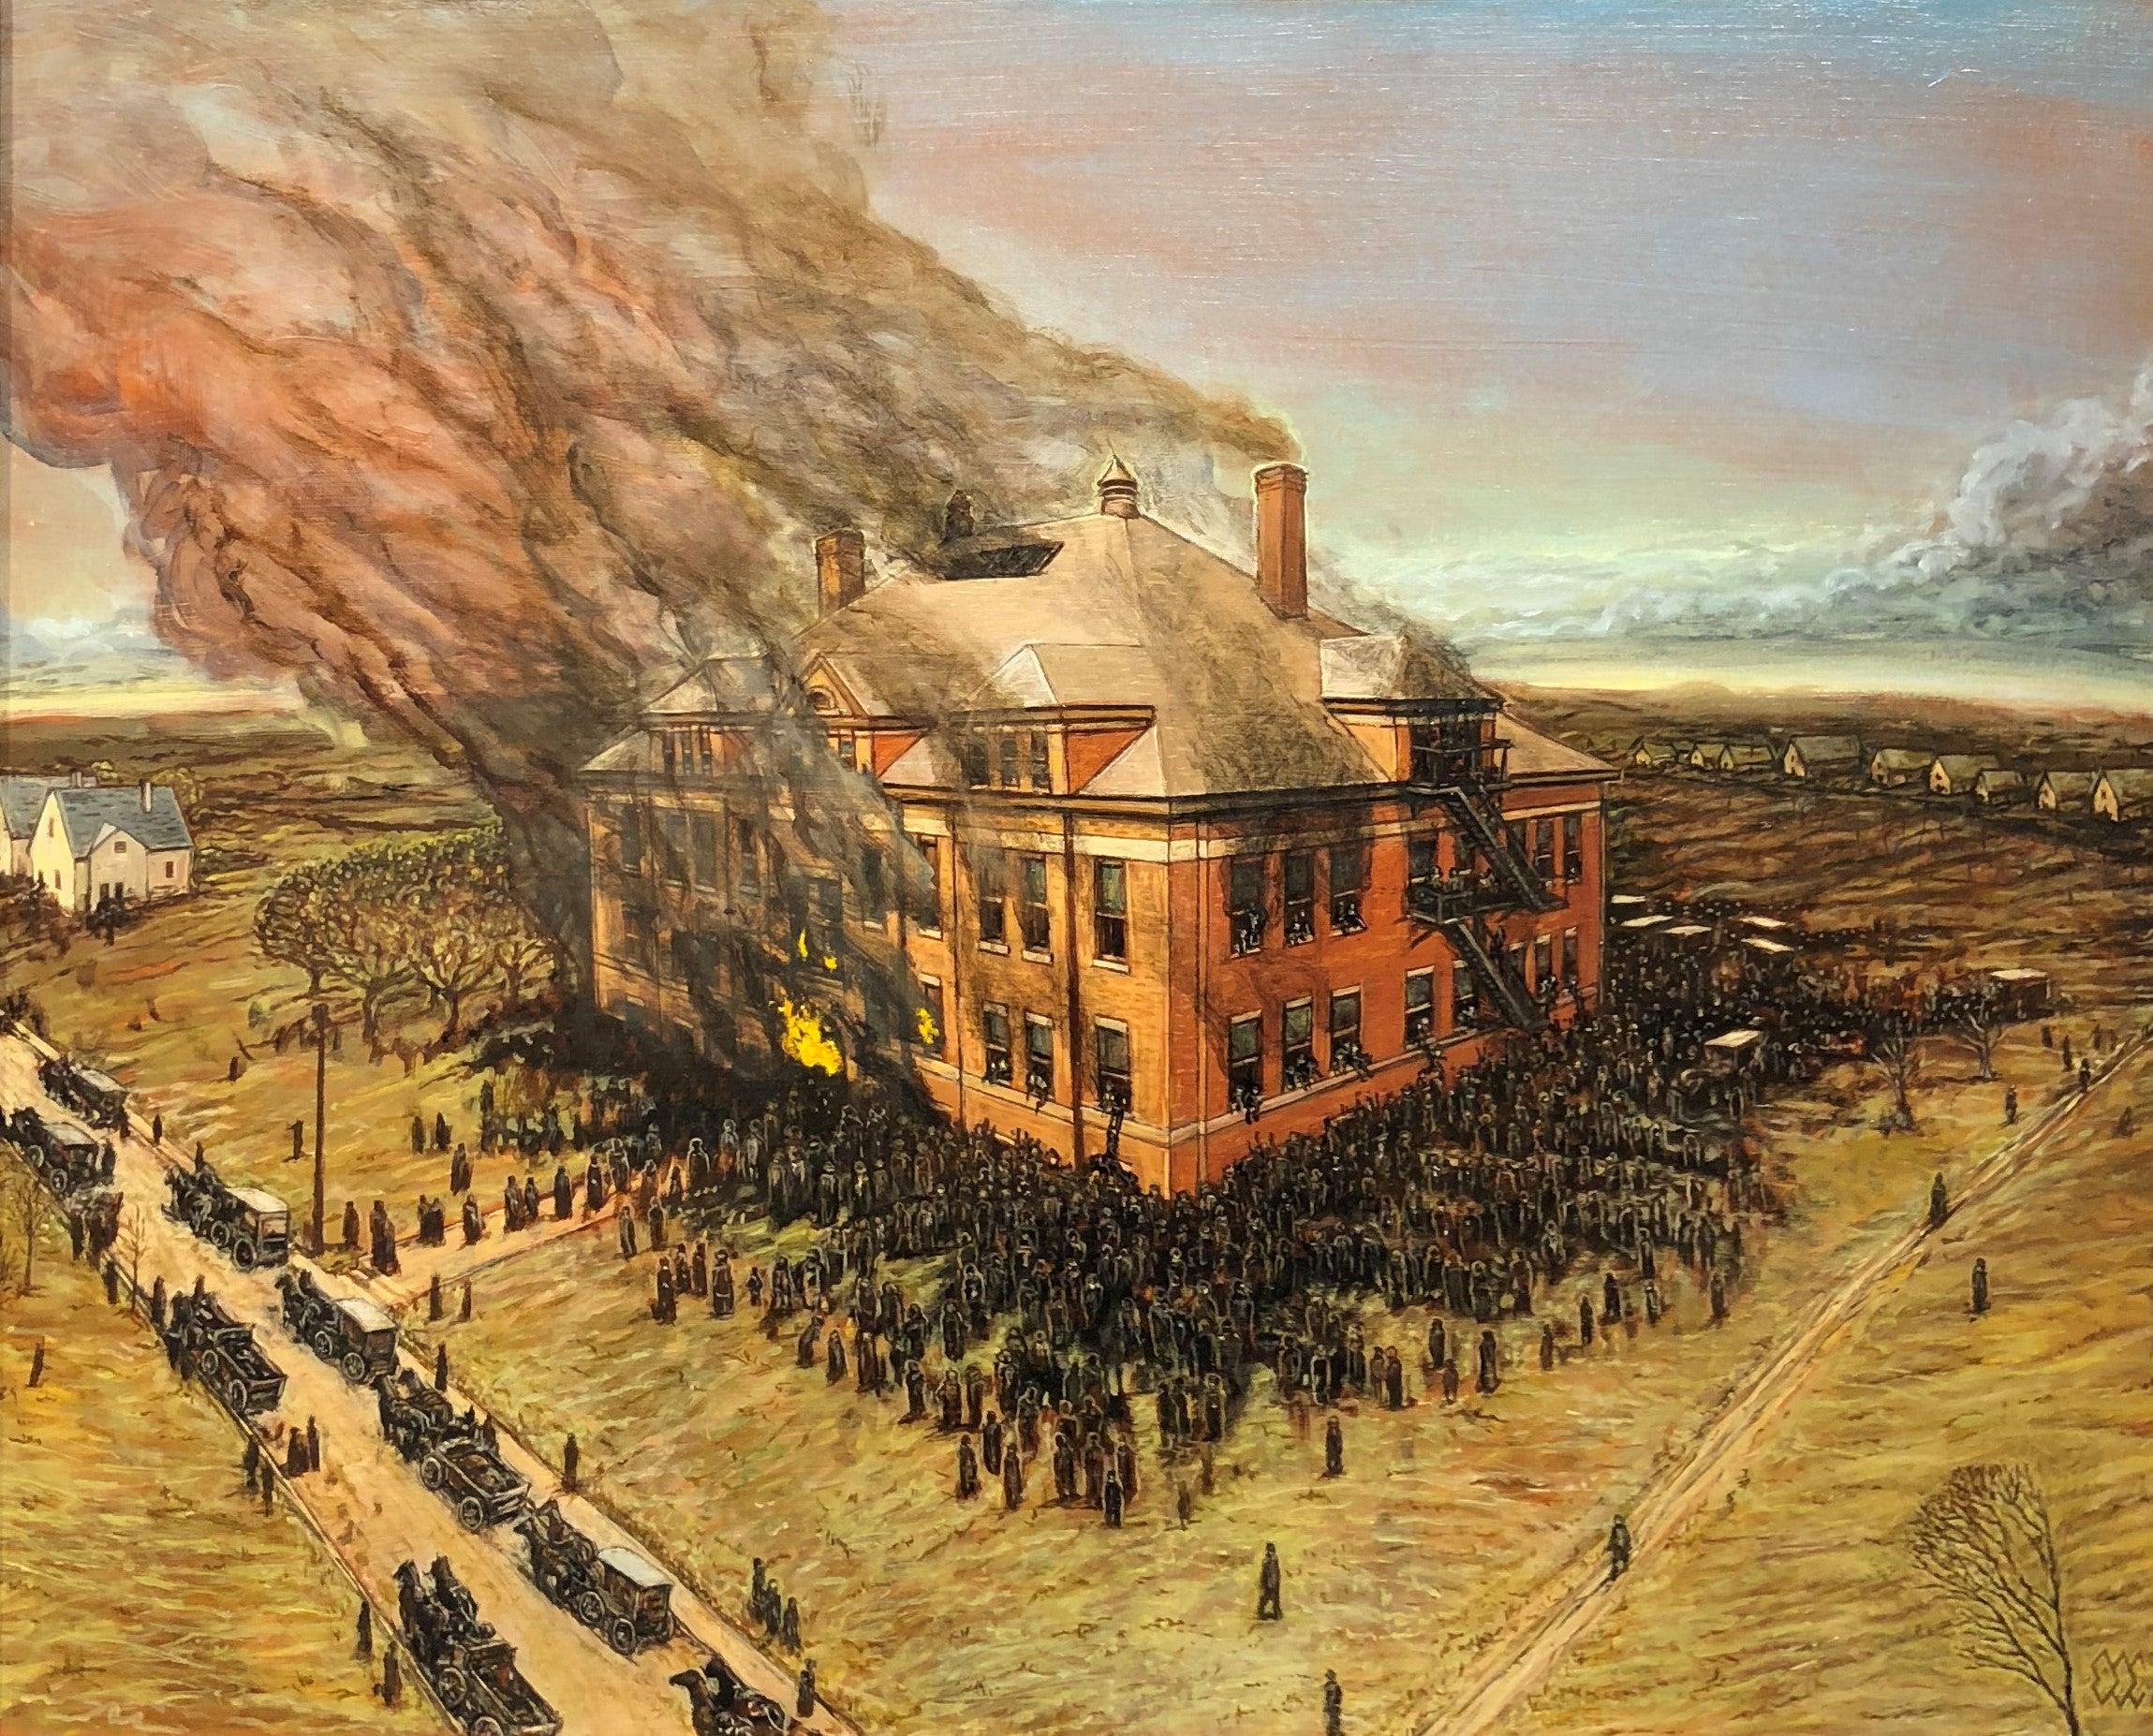 Eric Edward Esper - Collinwood School Fire, Collinwood, Ohio